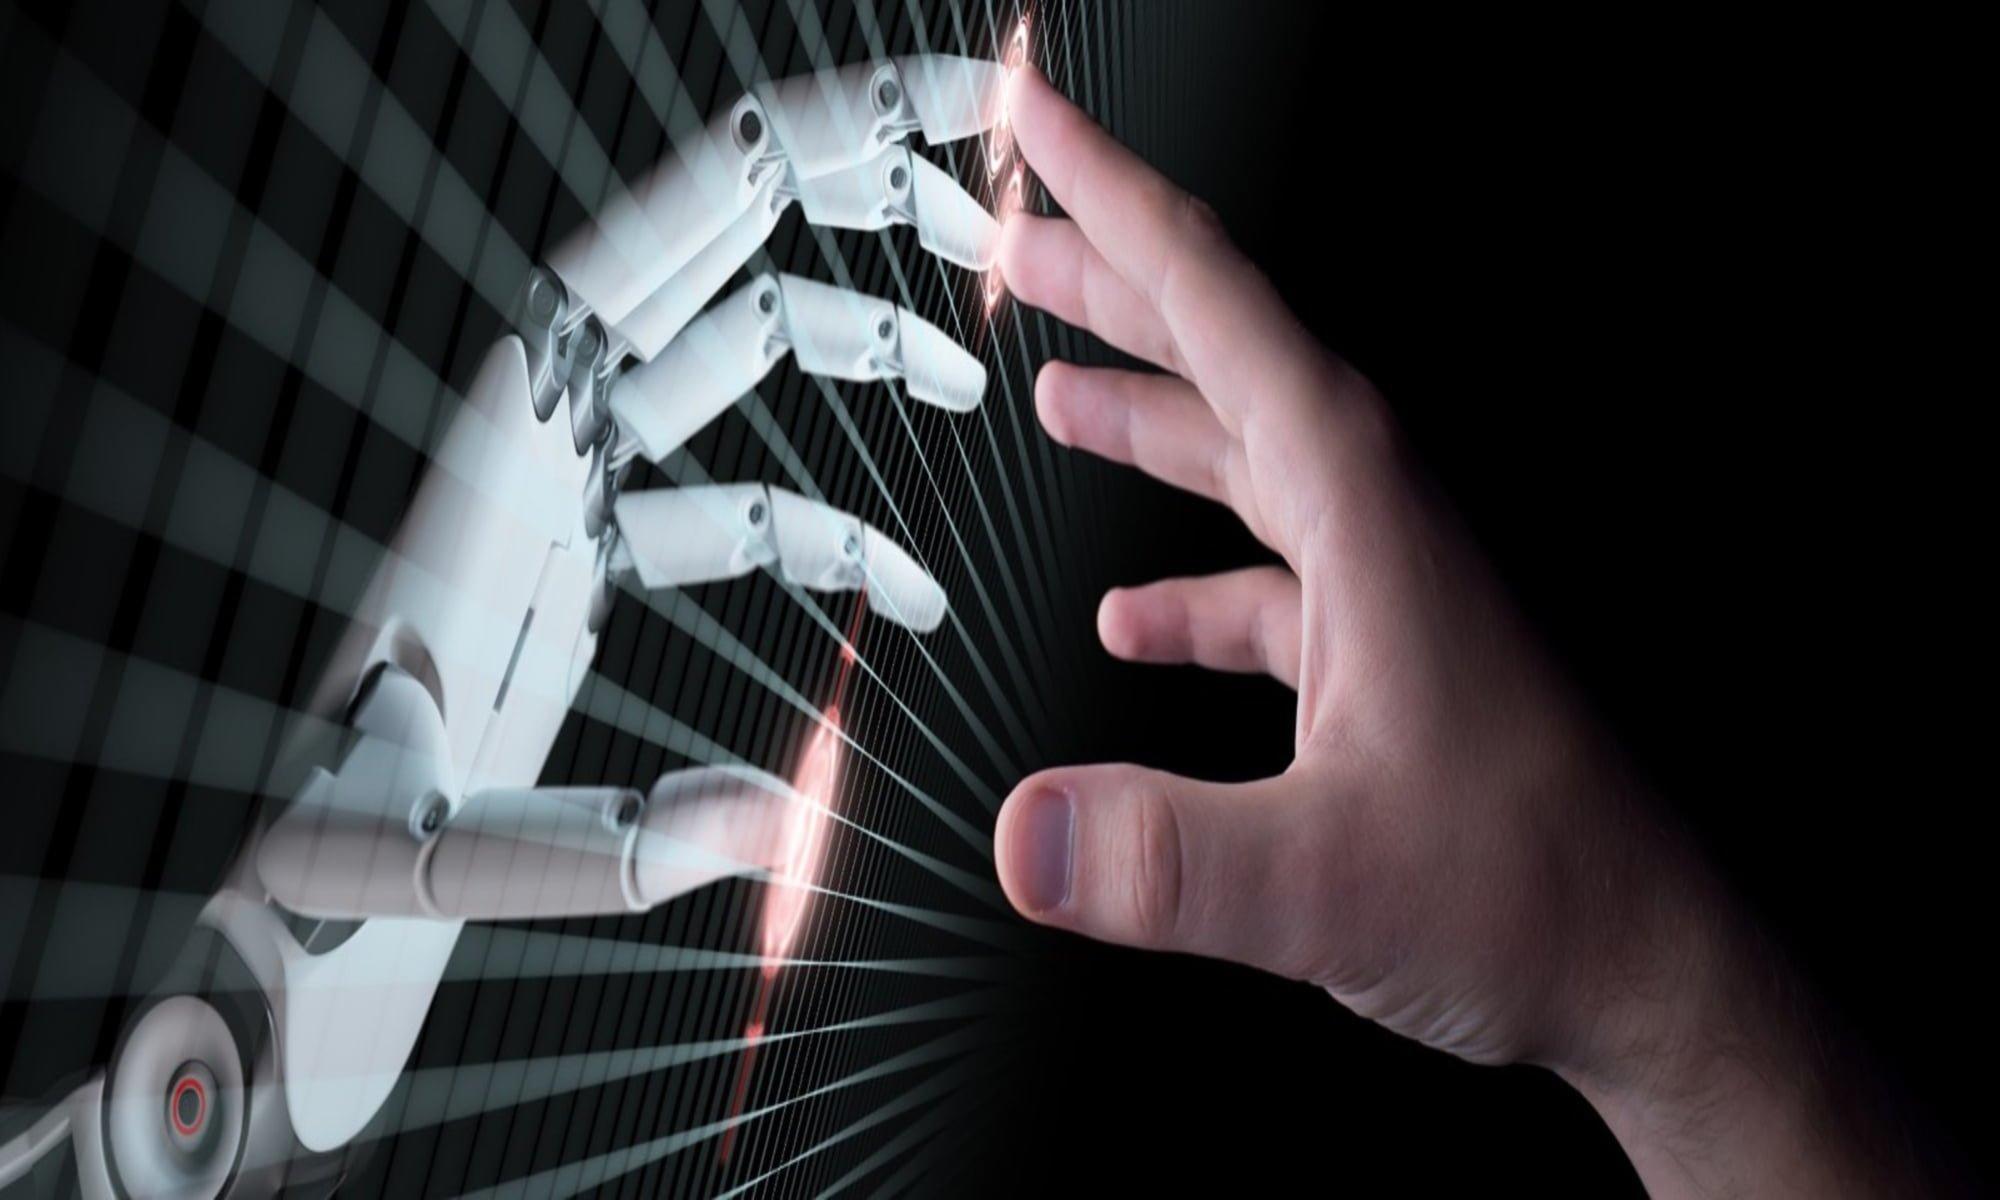 Leaders need to prepare for hybrid AI workforce - Rialto